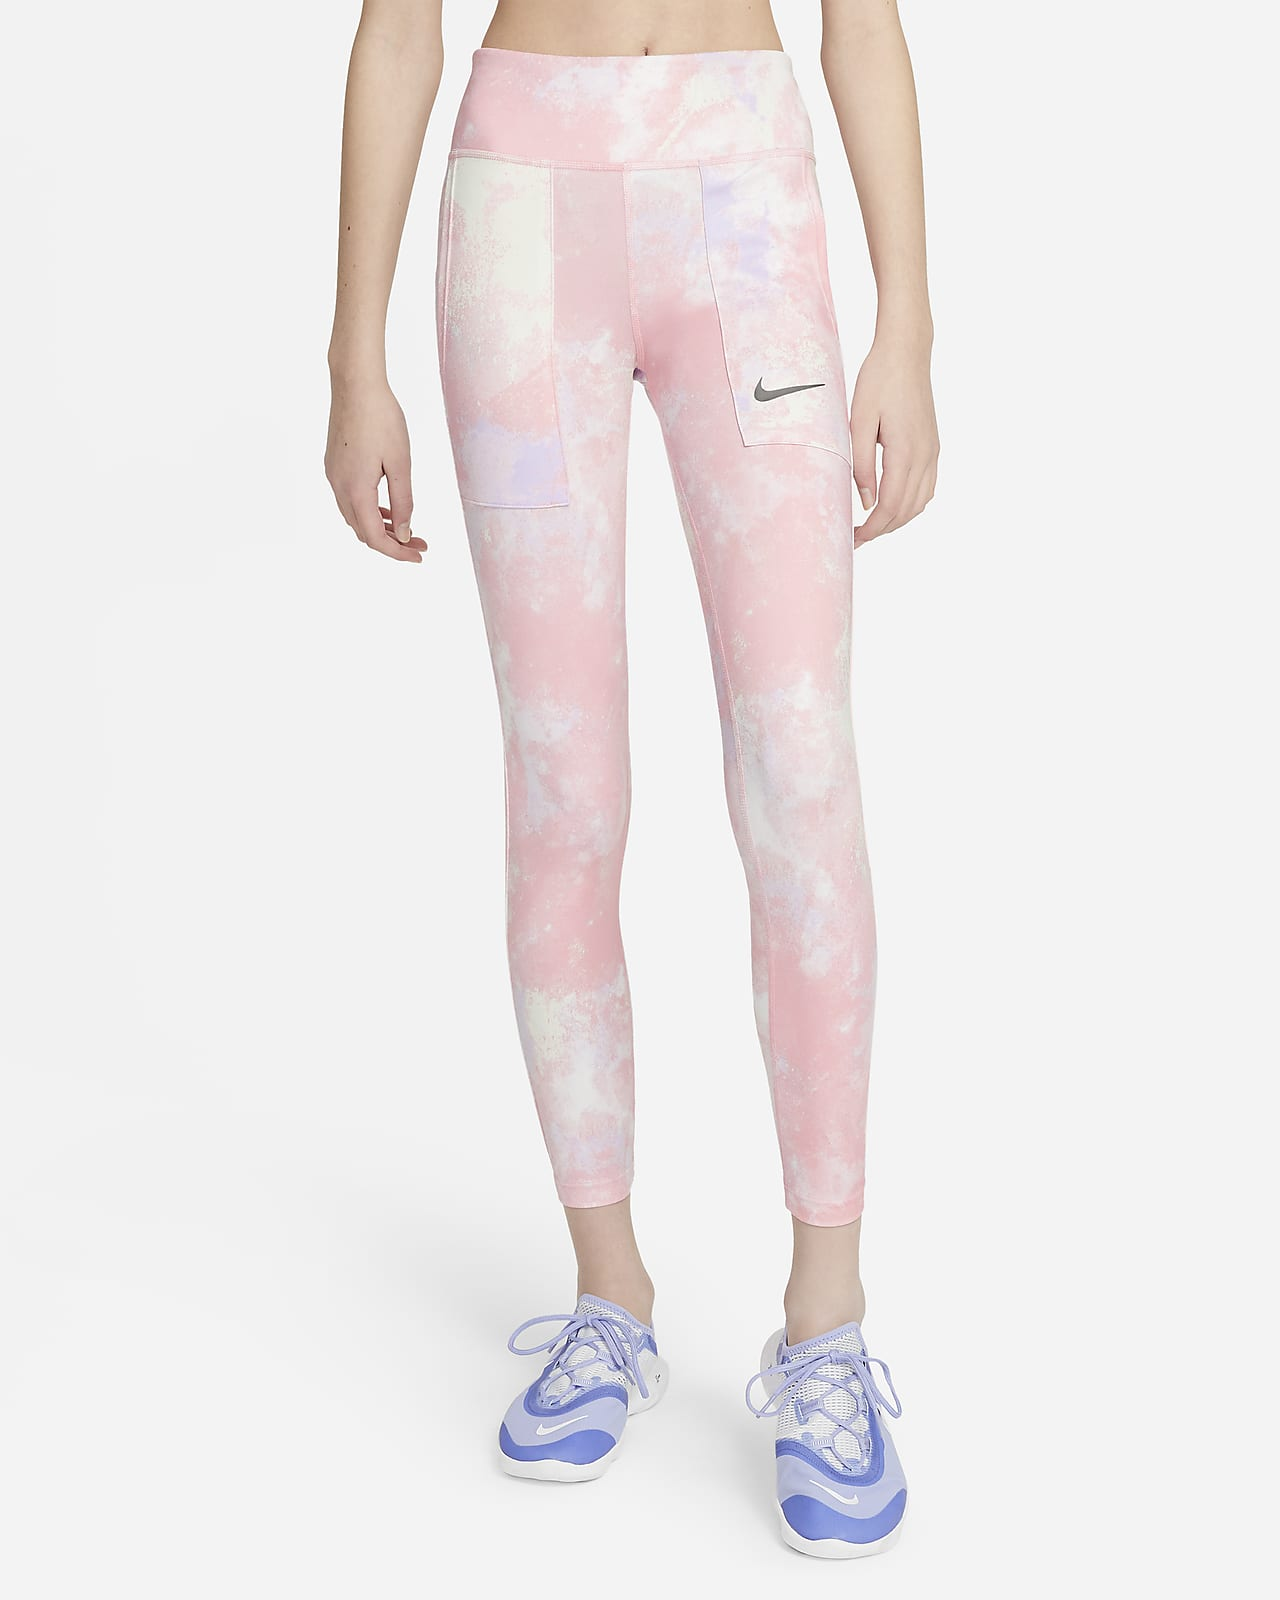 Nike One Leggings con estampado tie-dye - Niña